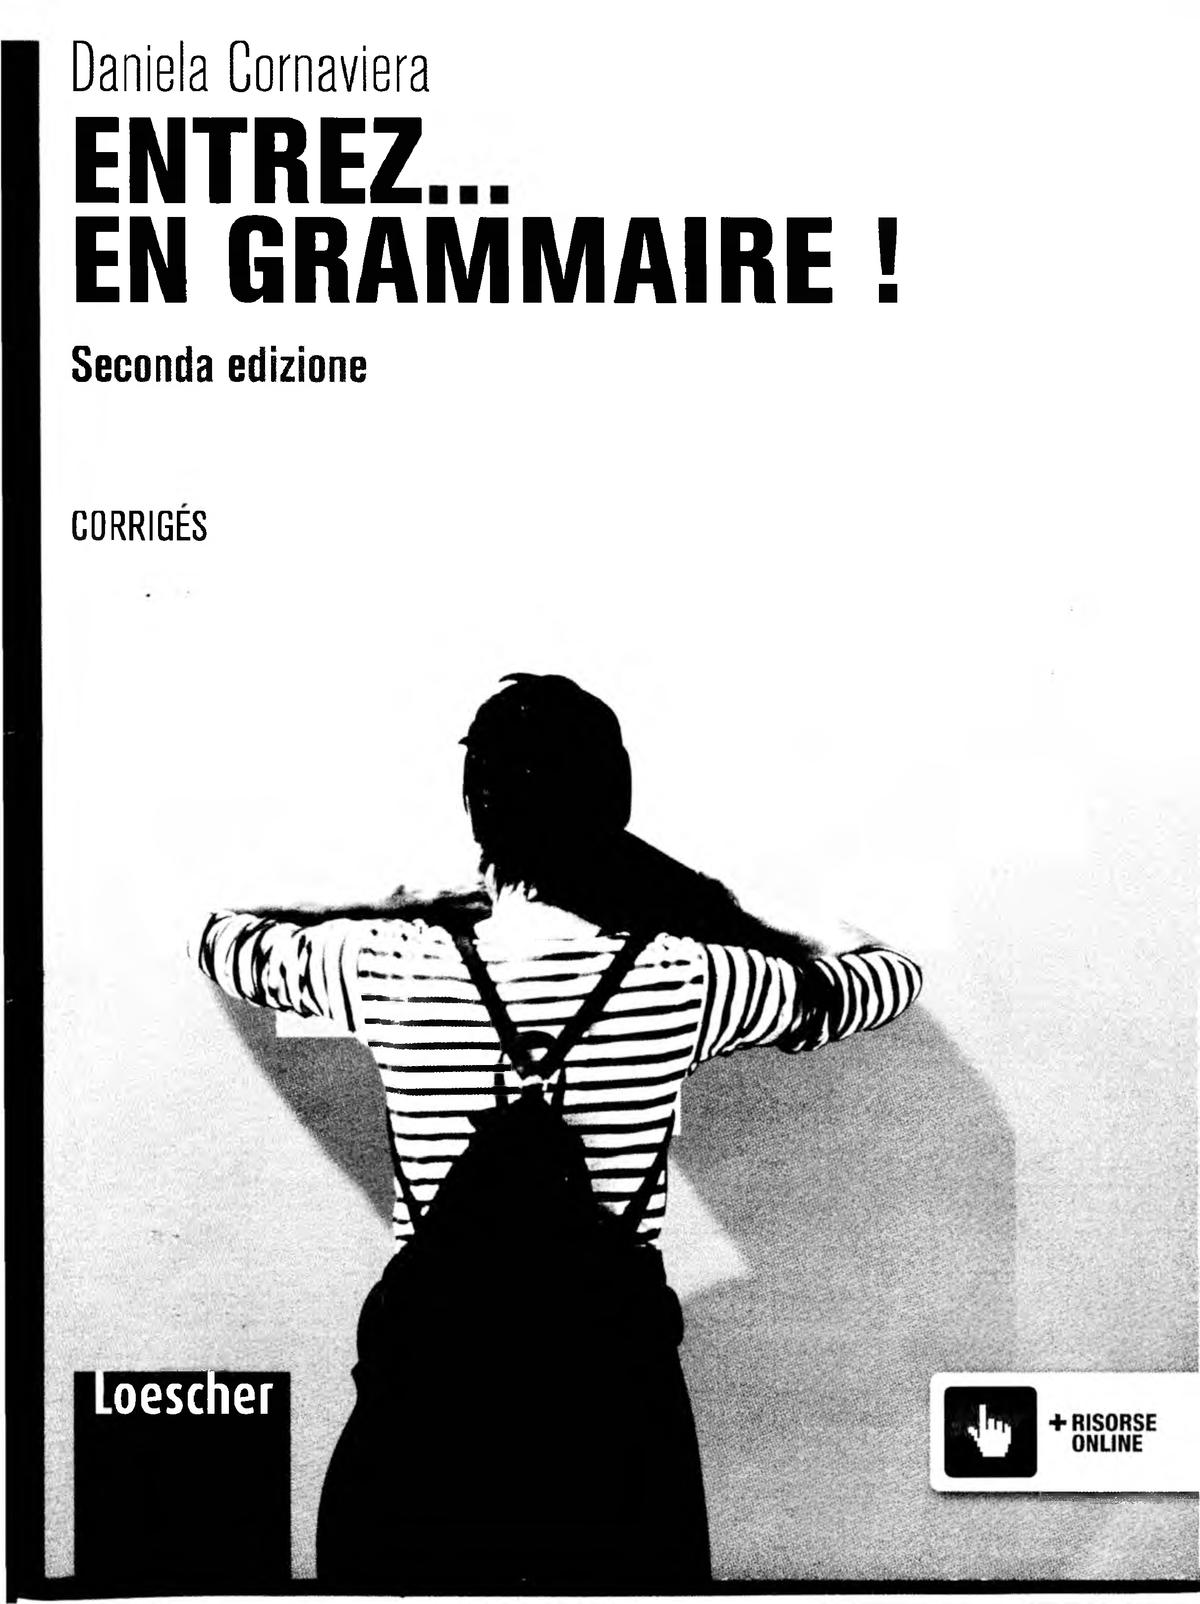 Soluzioni Libro Entrez En Grammaire D Cornaviera Studocu